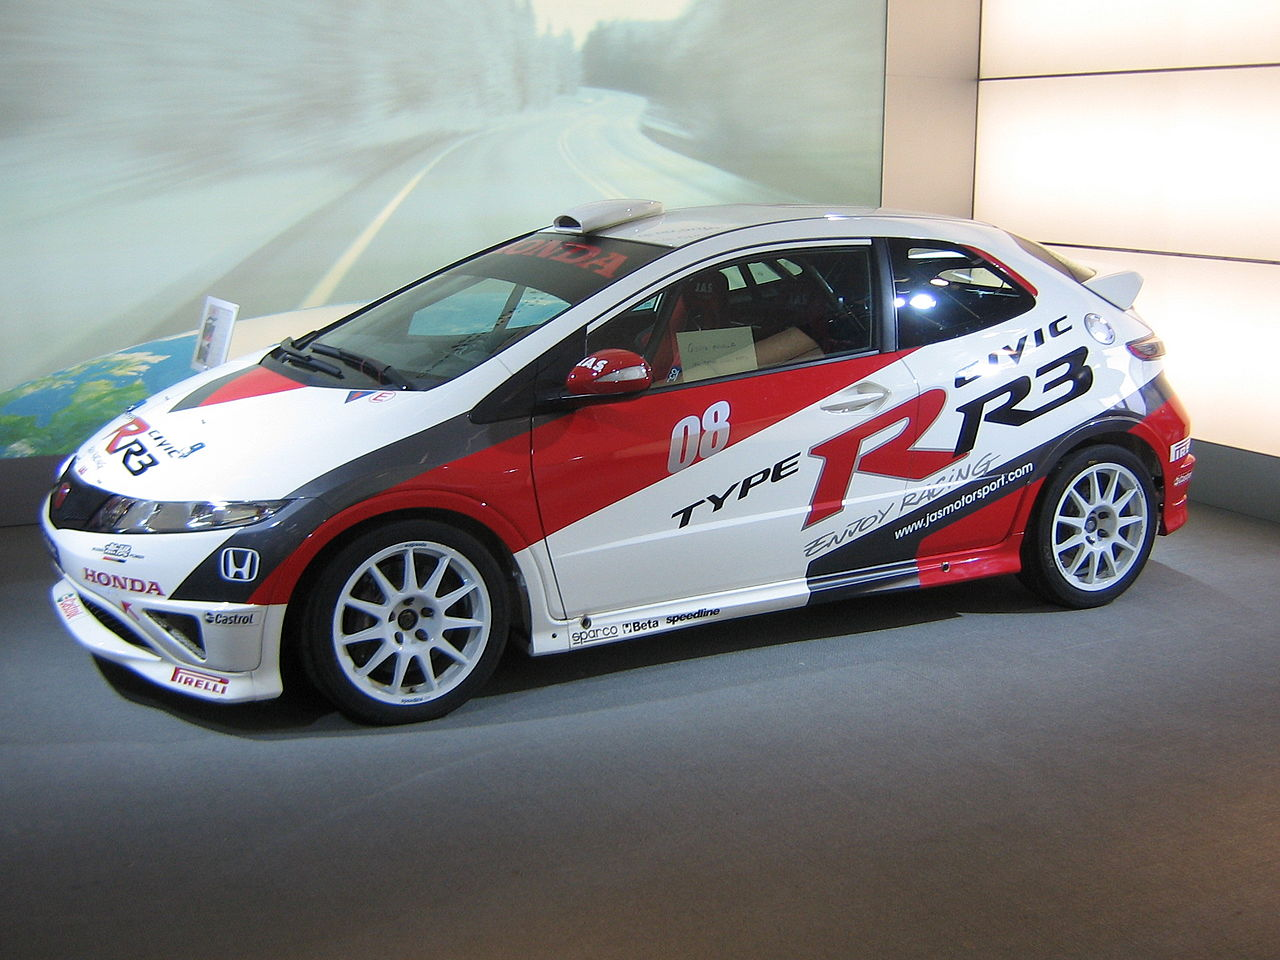 Grc Civic >> Honda rally civic